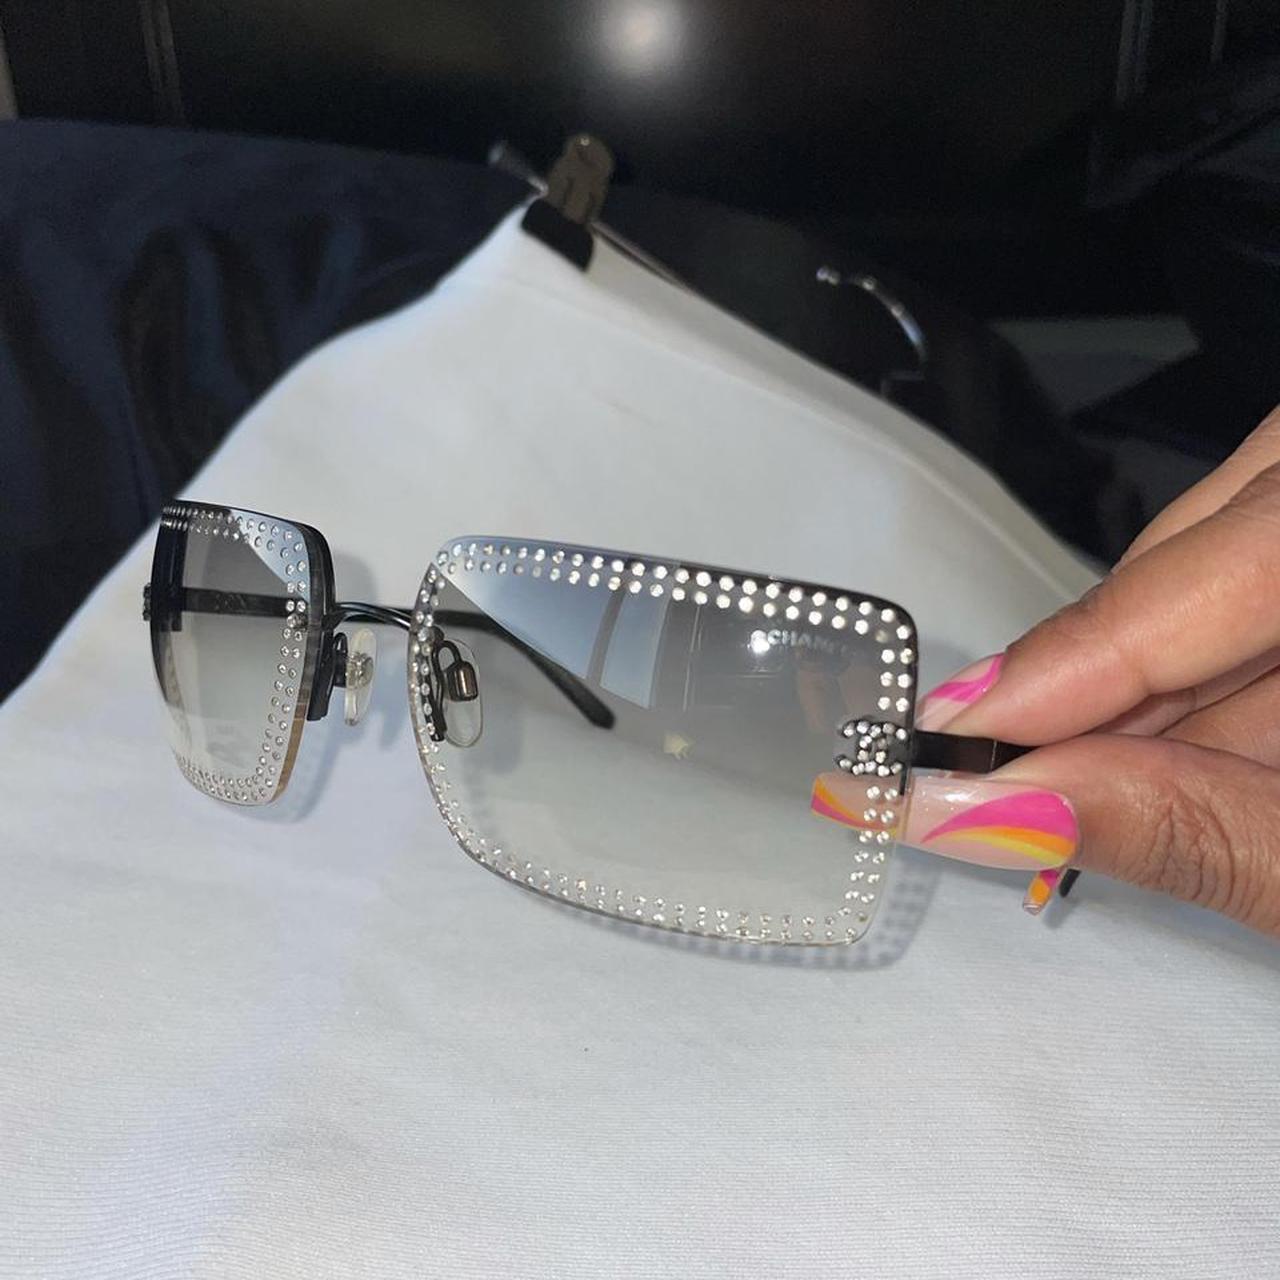 Product Image 1 - RARE Chanel 4105-B sunglasses 💎